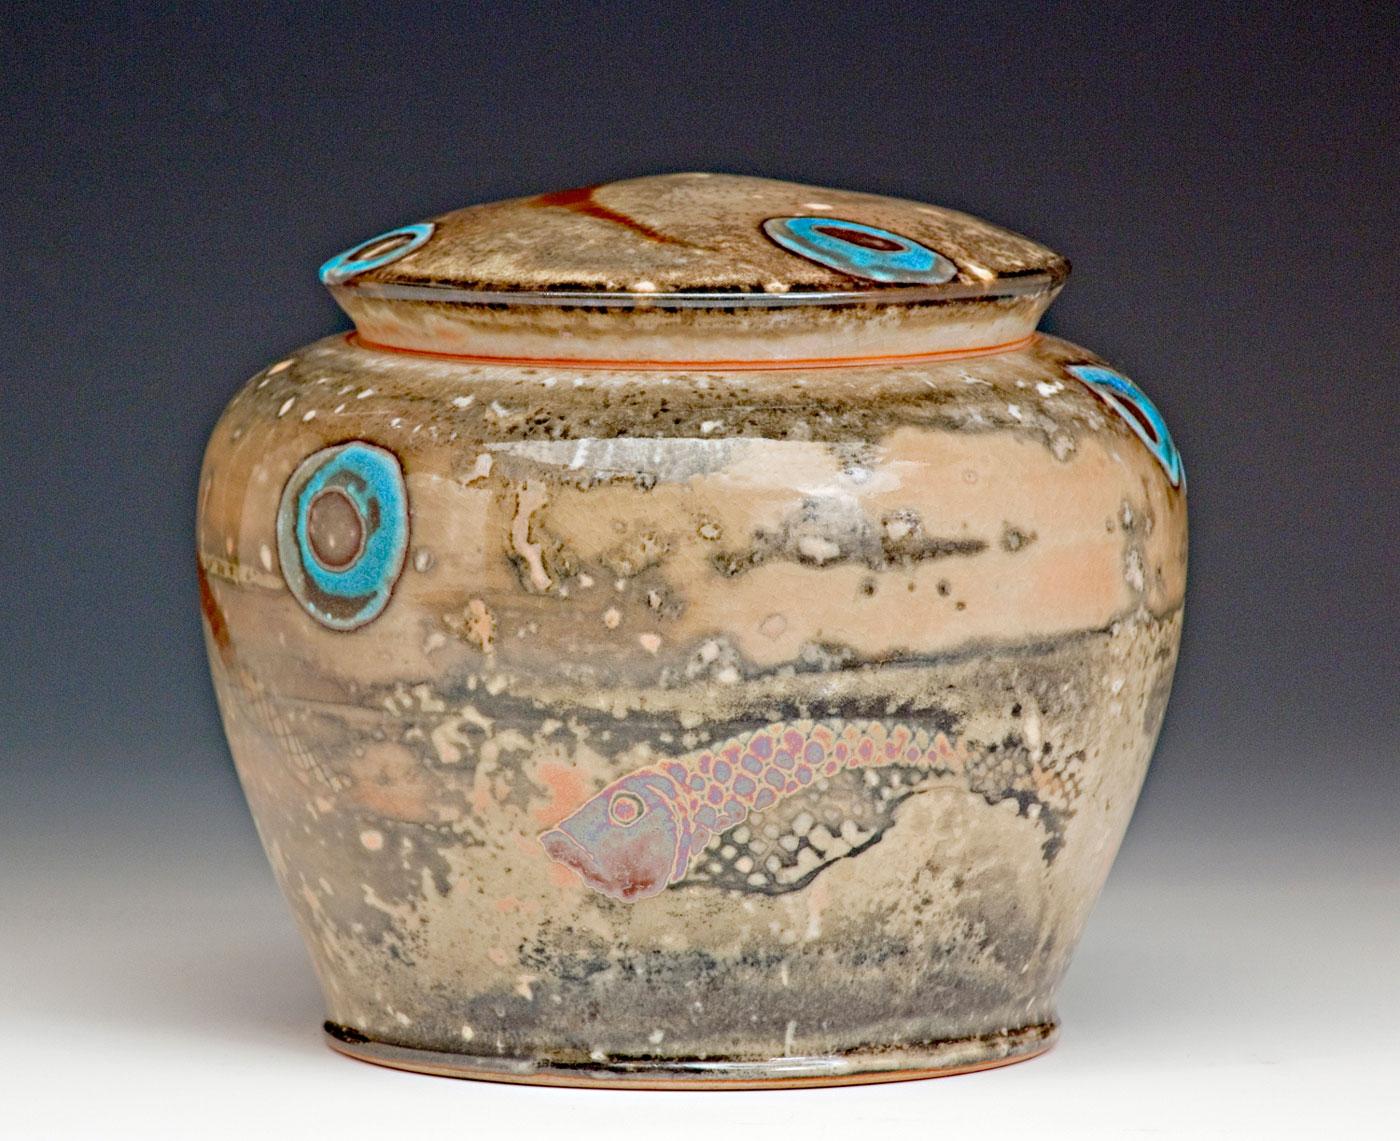 Bruce-Gholson-Shino-Ginger-Jar-Bulldog-Pottery.jpg